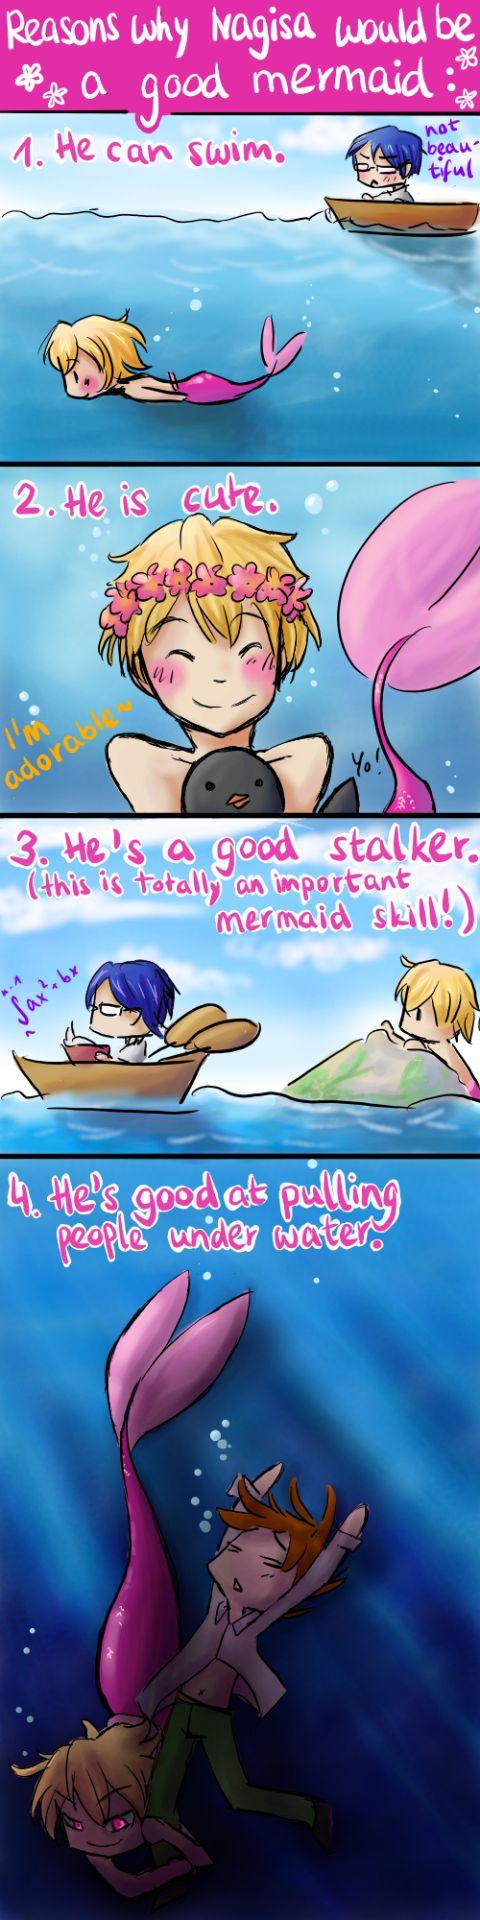 Reasons why Nagisa would be the best mermaid